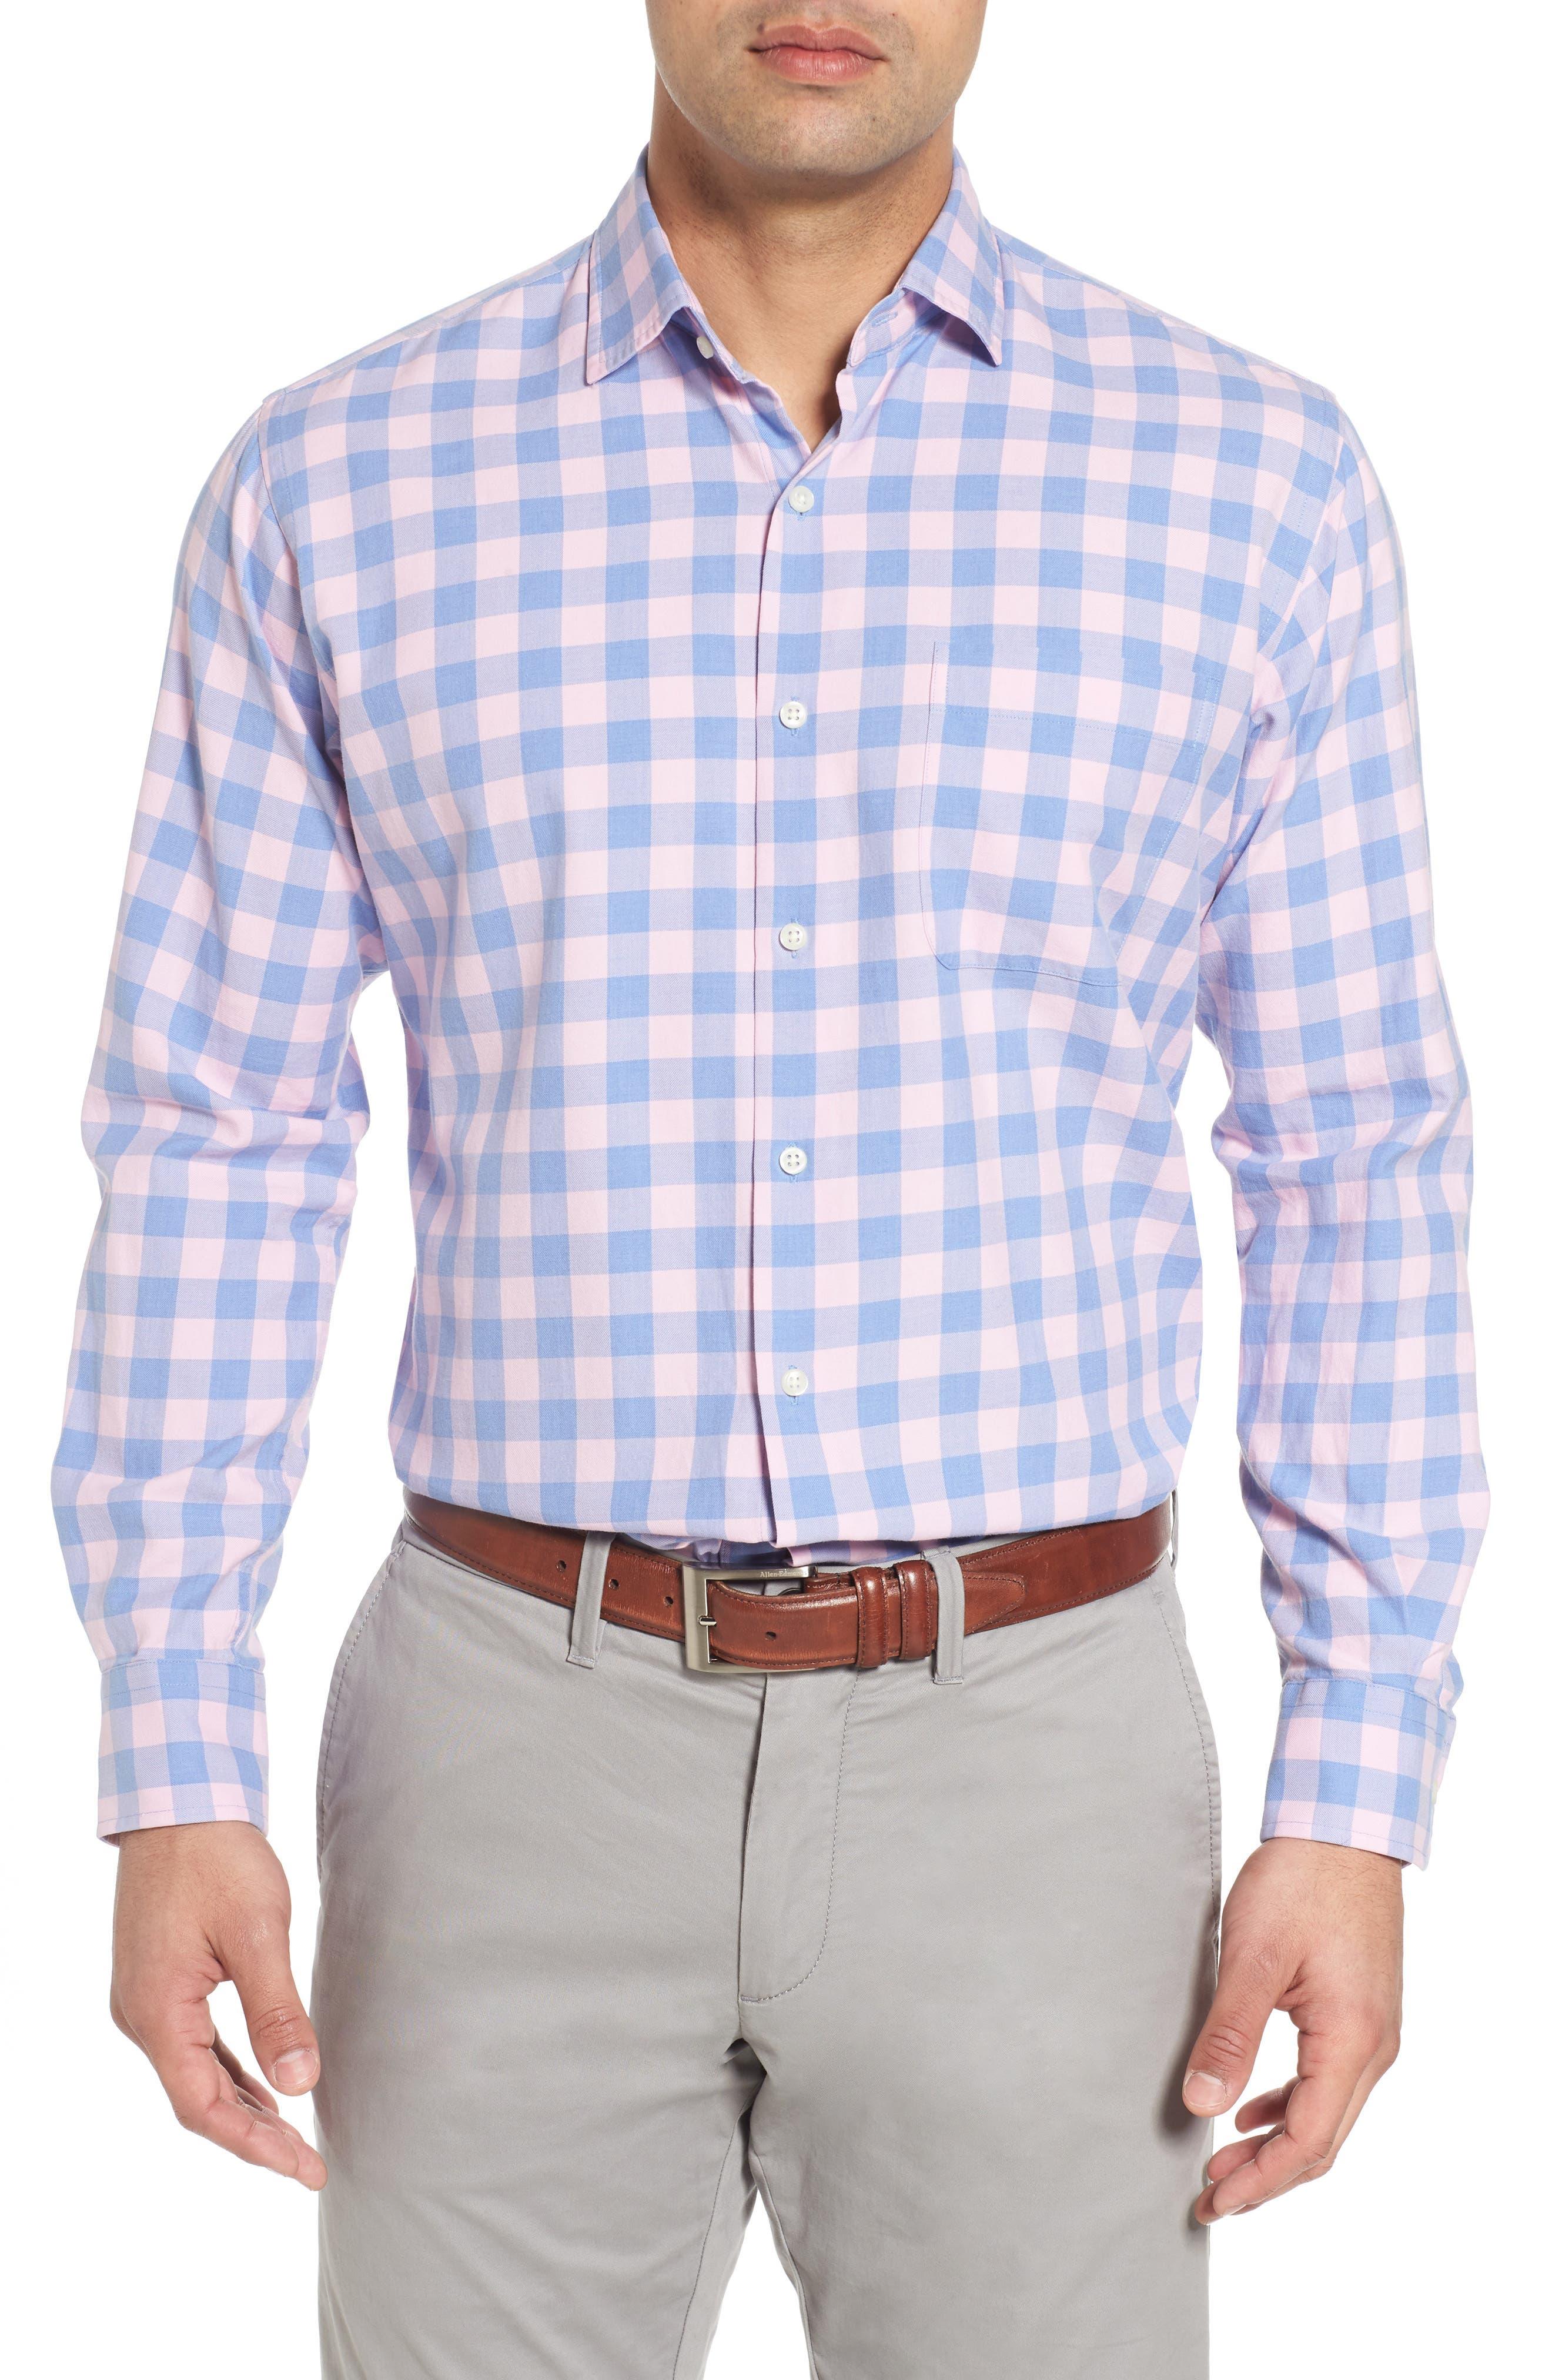 Seaglass Gingham Check Sport Shirt,                         Main,                         color, Bonnet